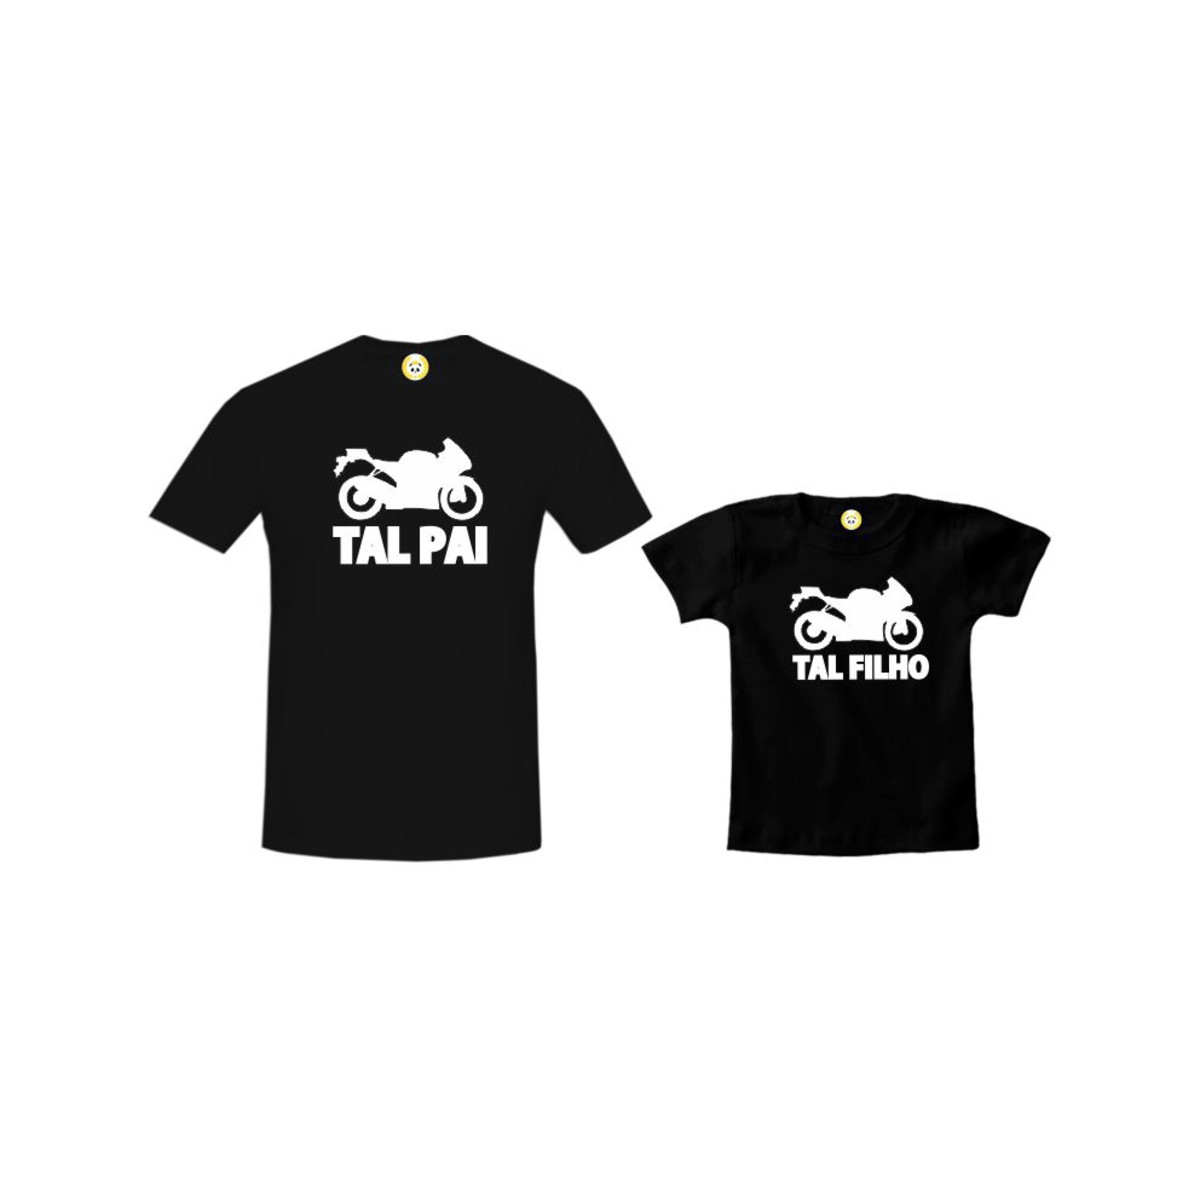 dc5dc62890fc8a Kit Camiseta Moto Tal Pai Tal Filho